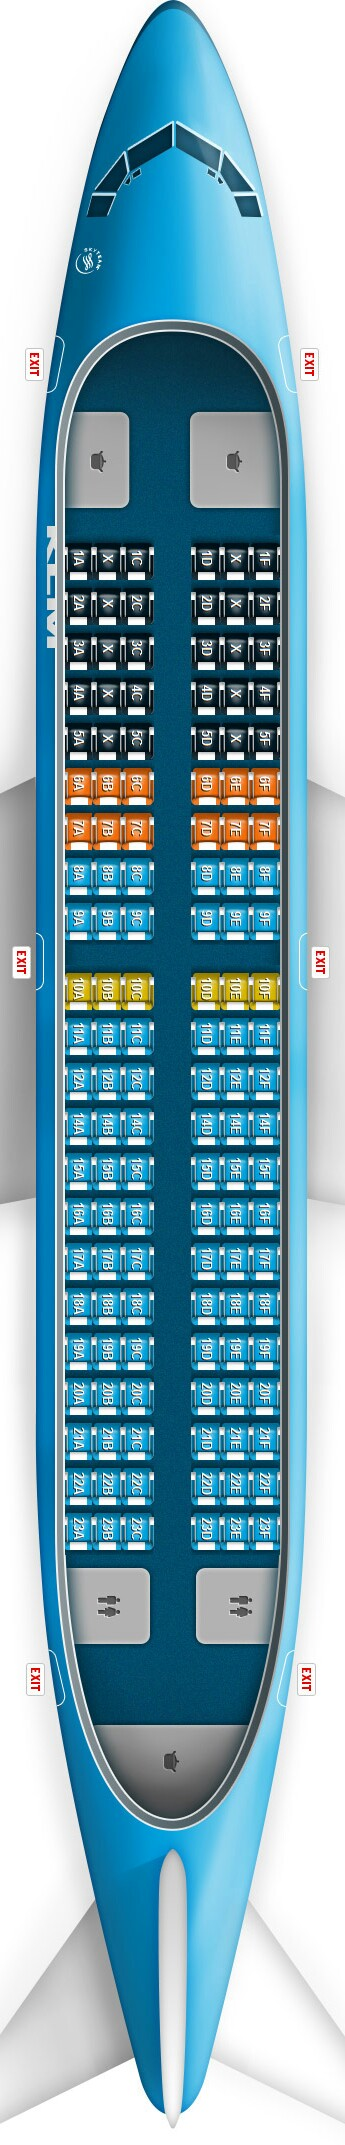 KLM 737-700 Seat Map